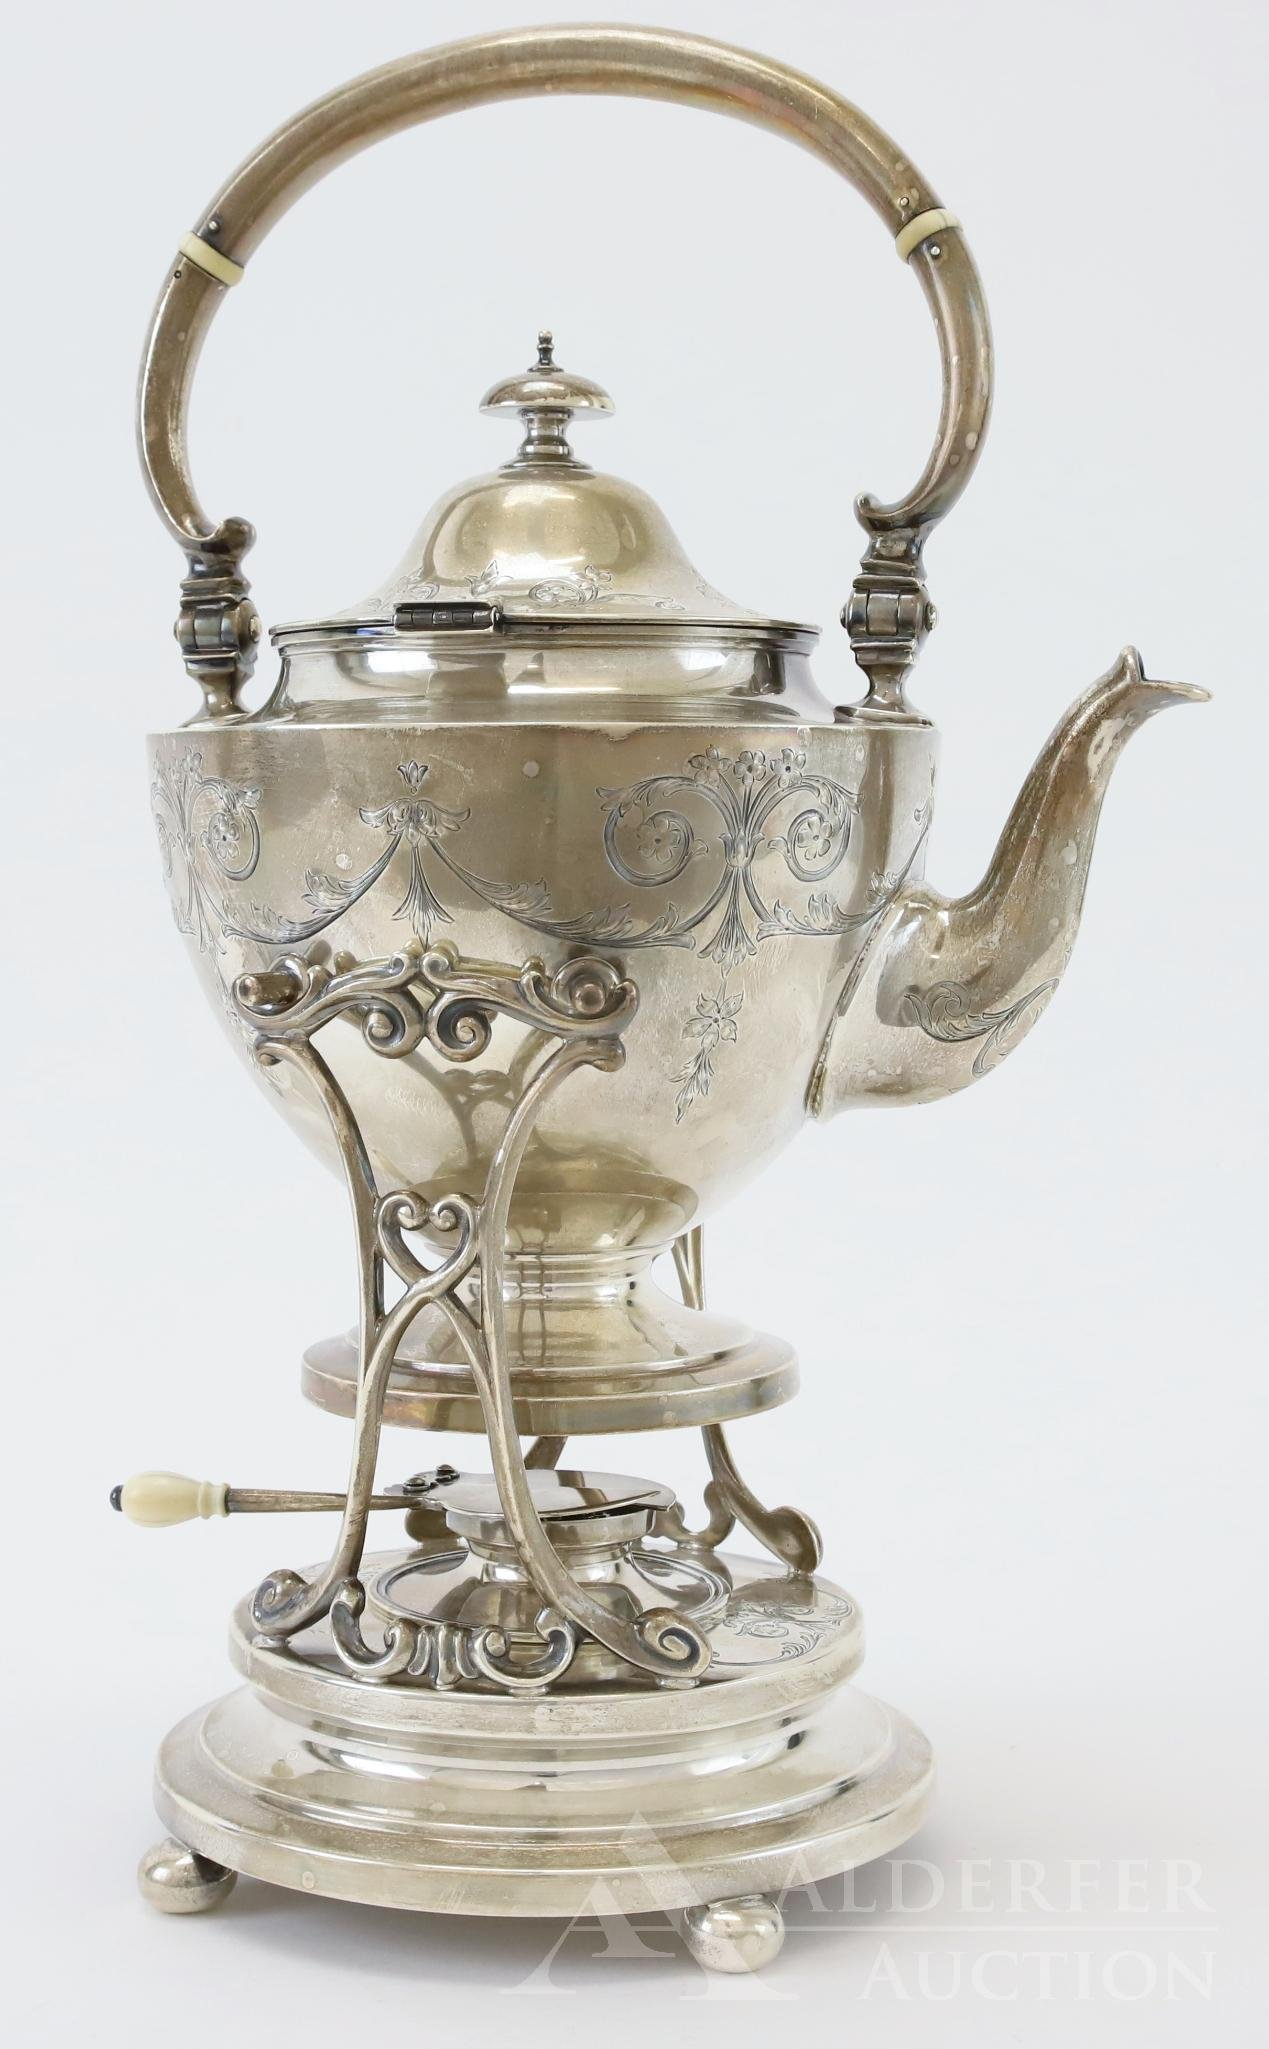 Gorham Sterling Silver Hot Water Pot